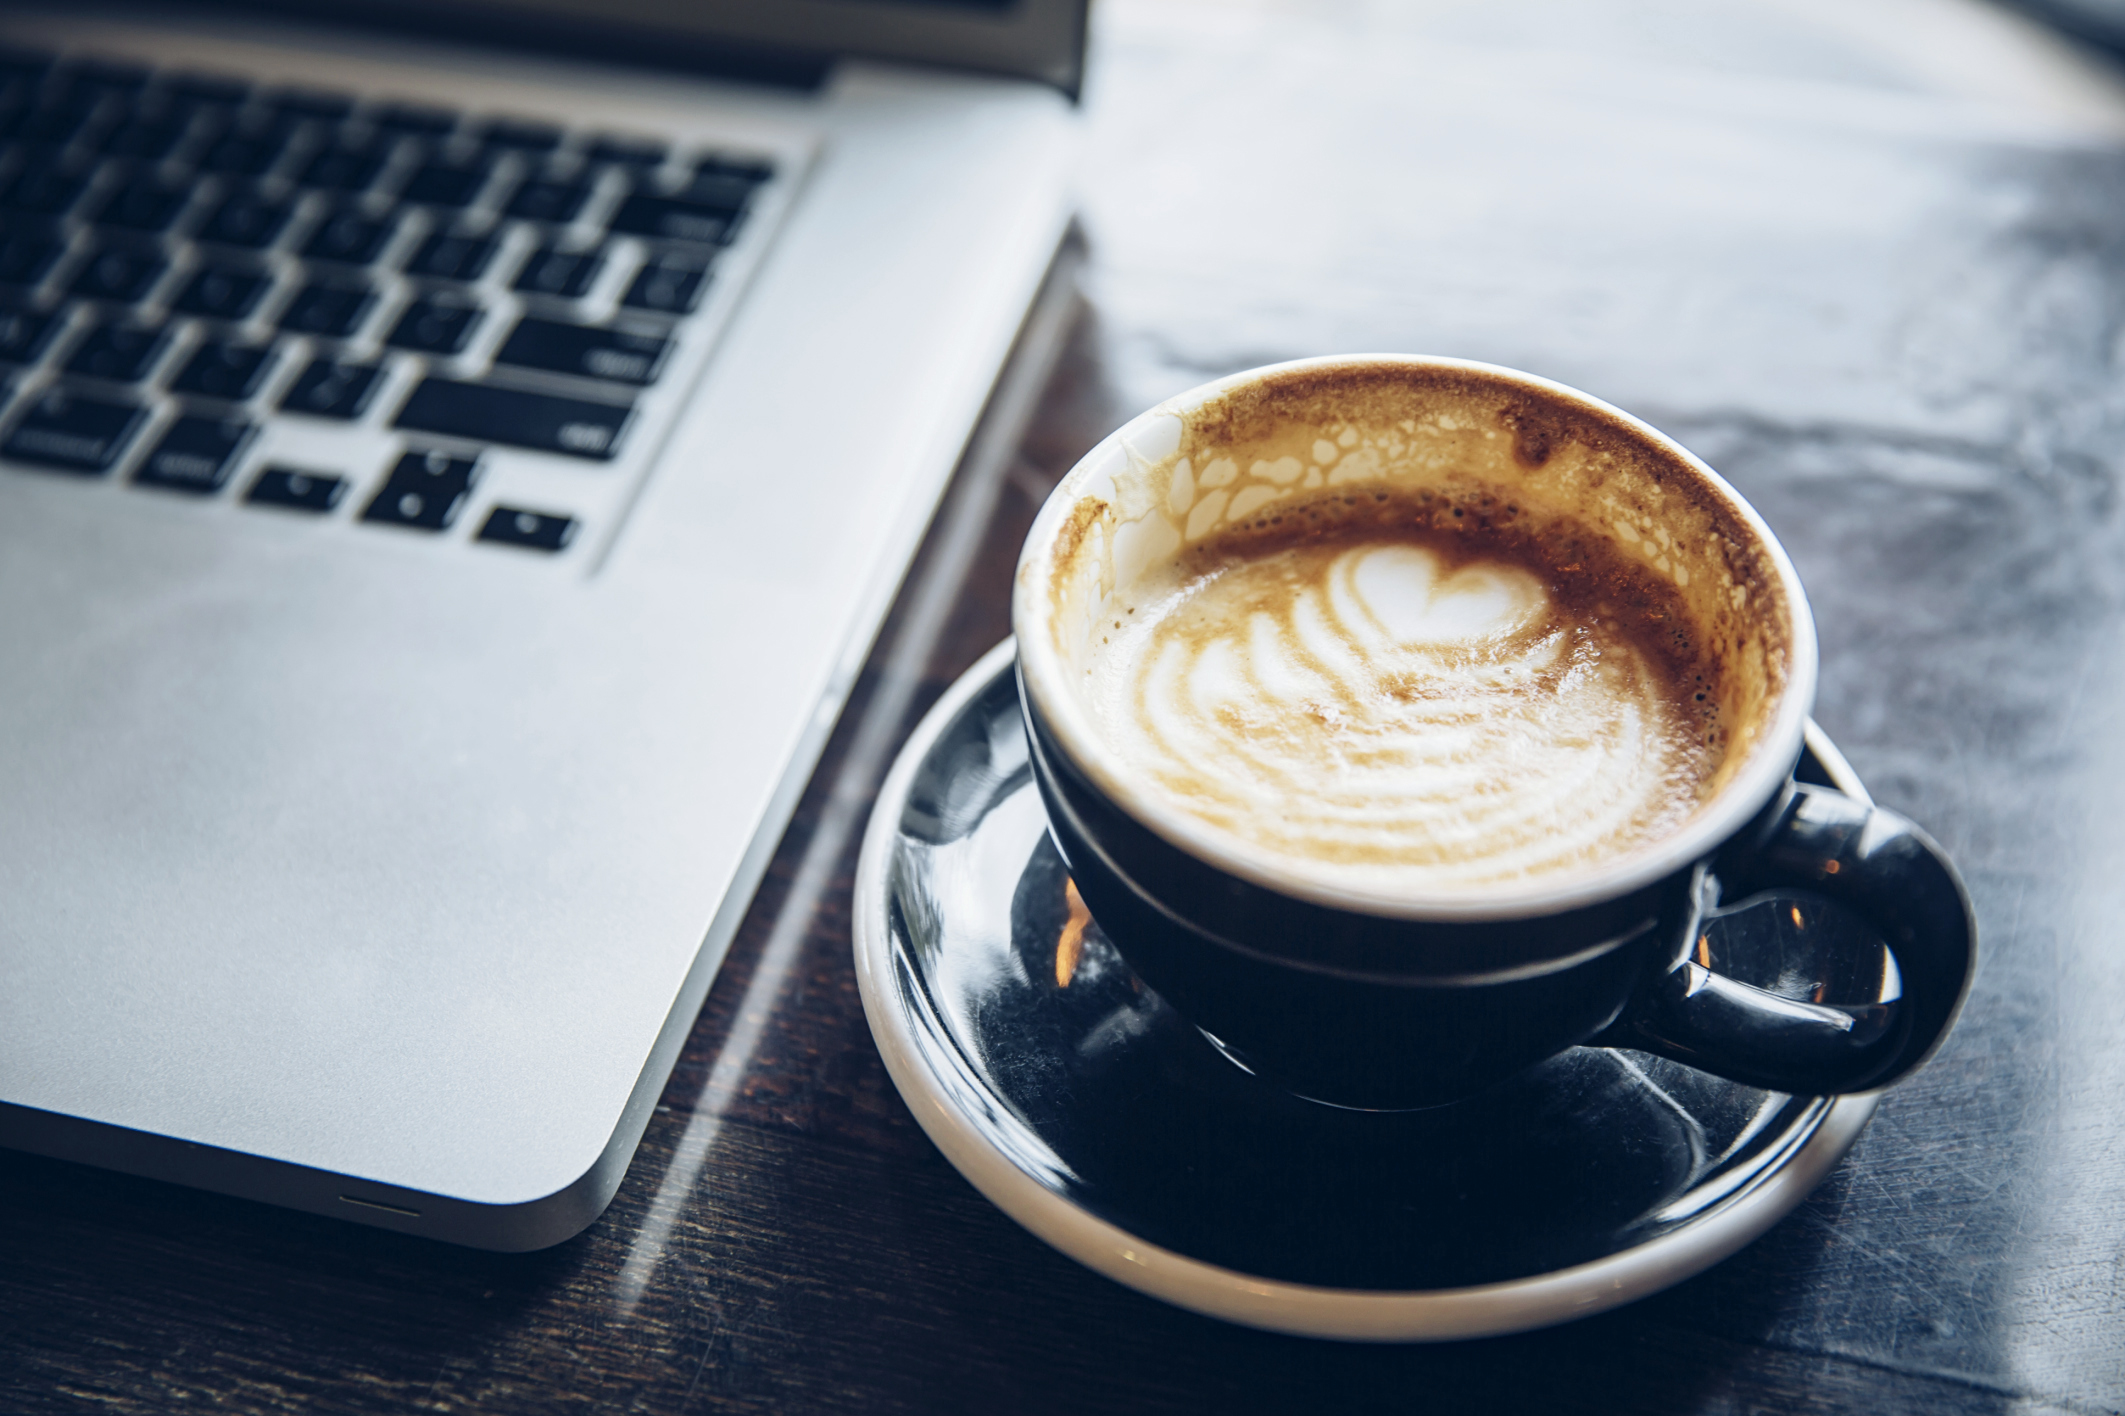 Is your coffee habit hurtful or helpful?